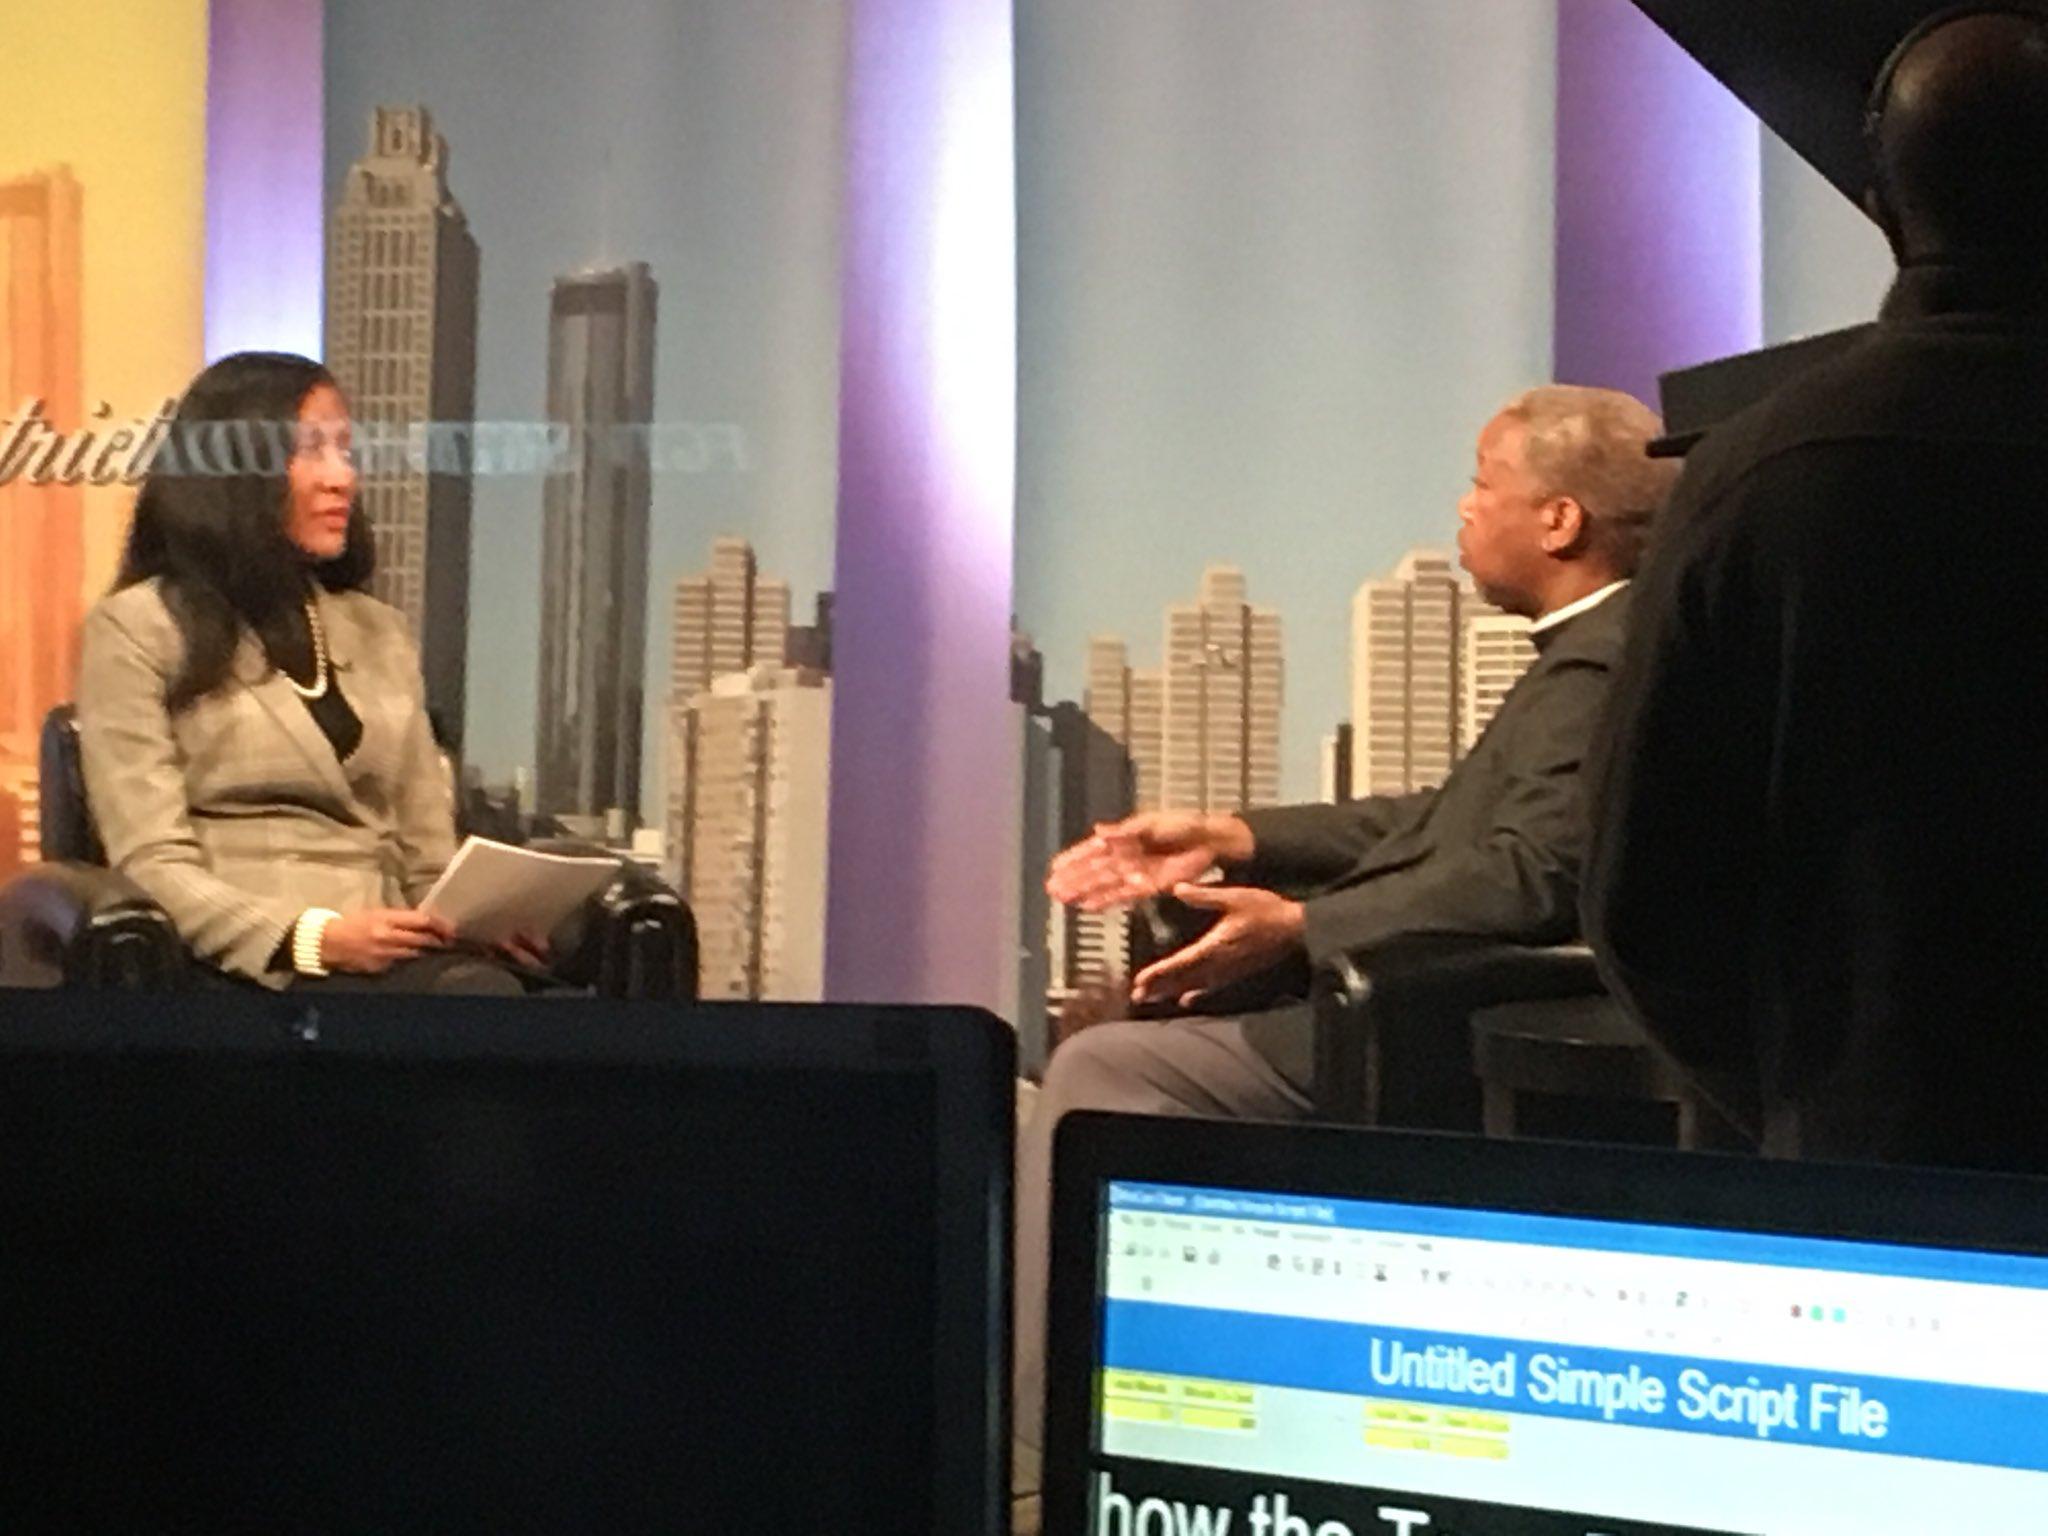 Rev Duncan Teague being interviewed, January 2019